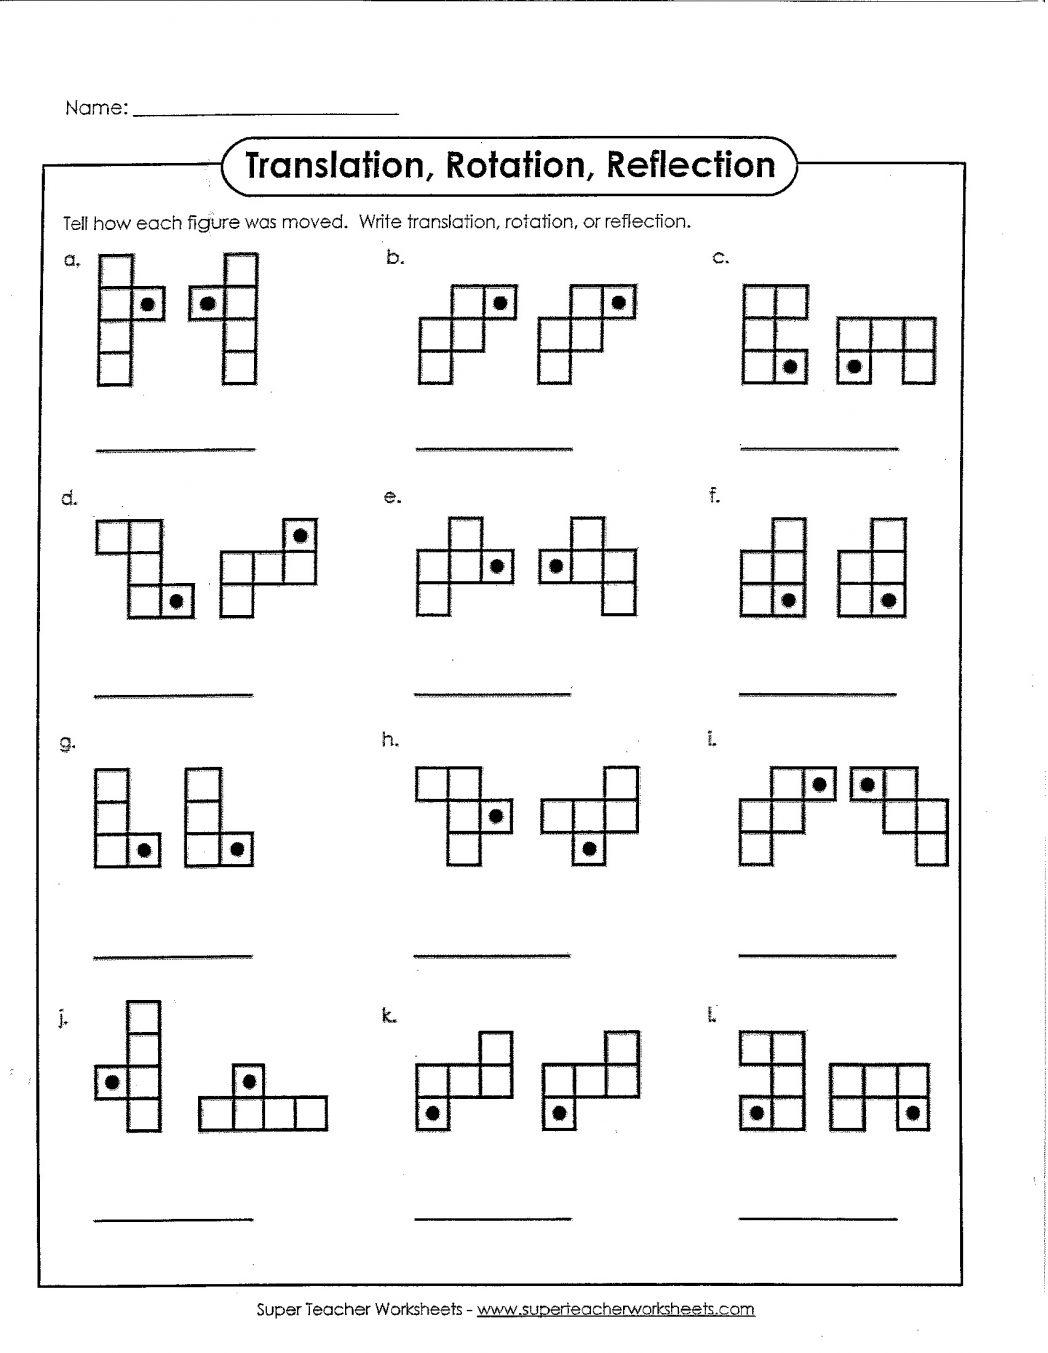 Translation Reflection Rotation Worksheet 4th Grade